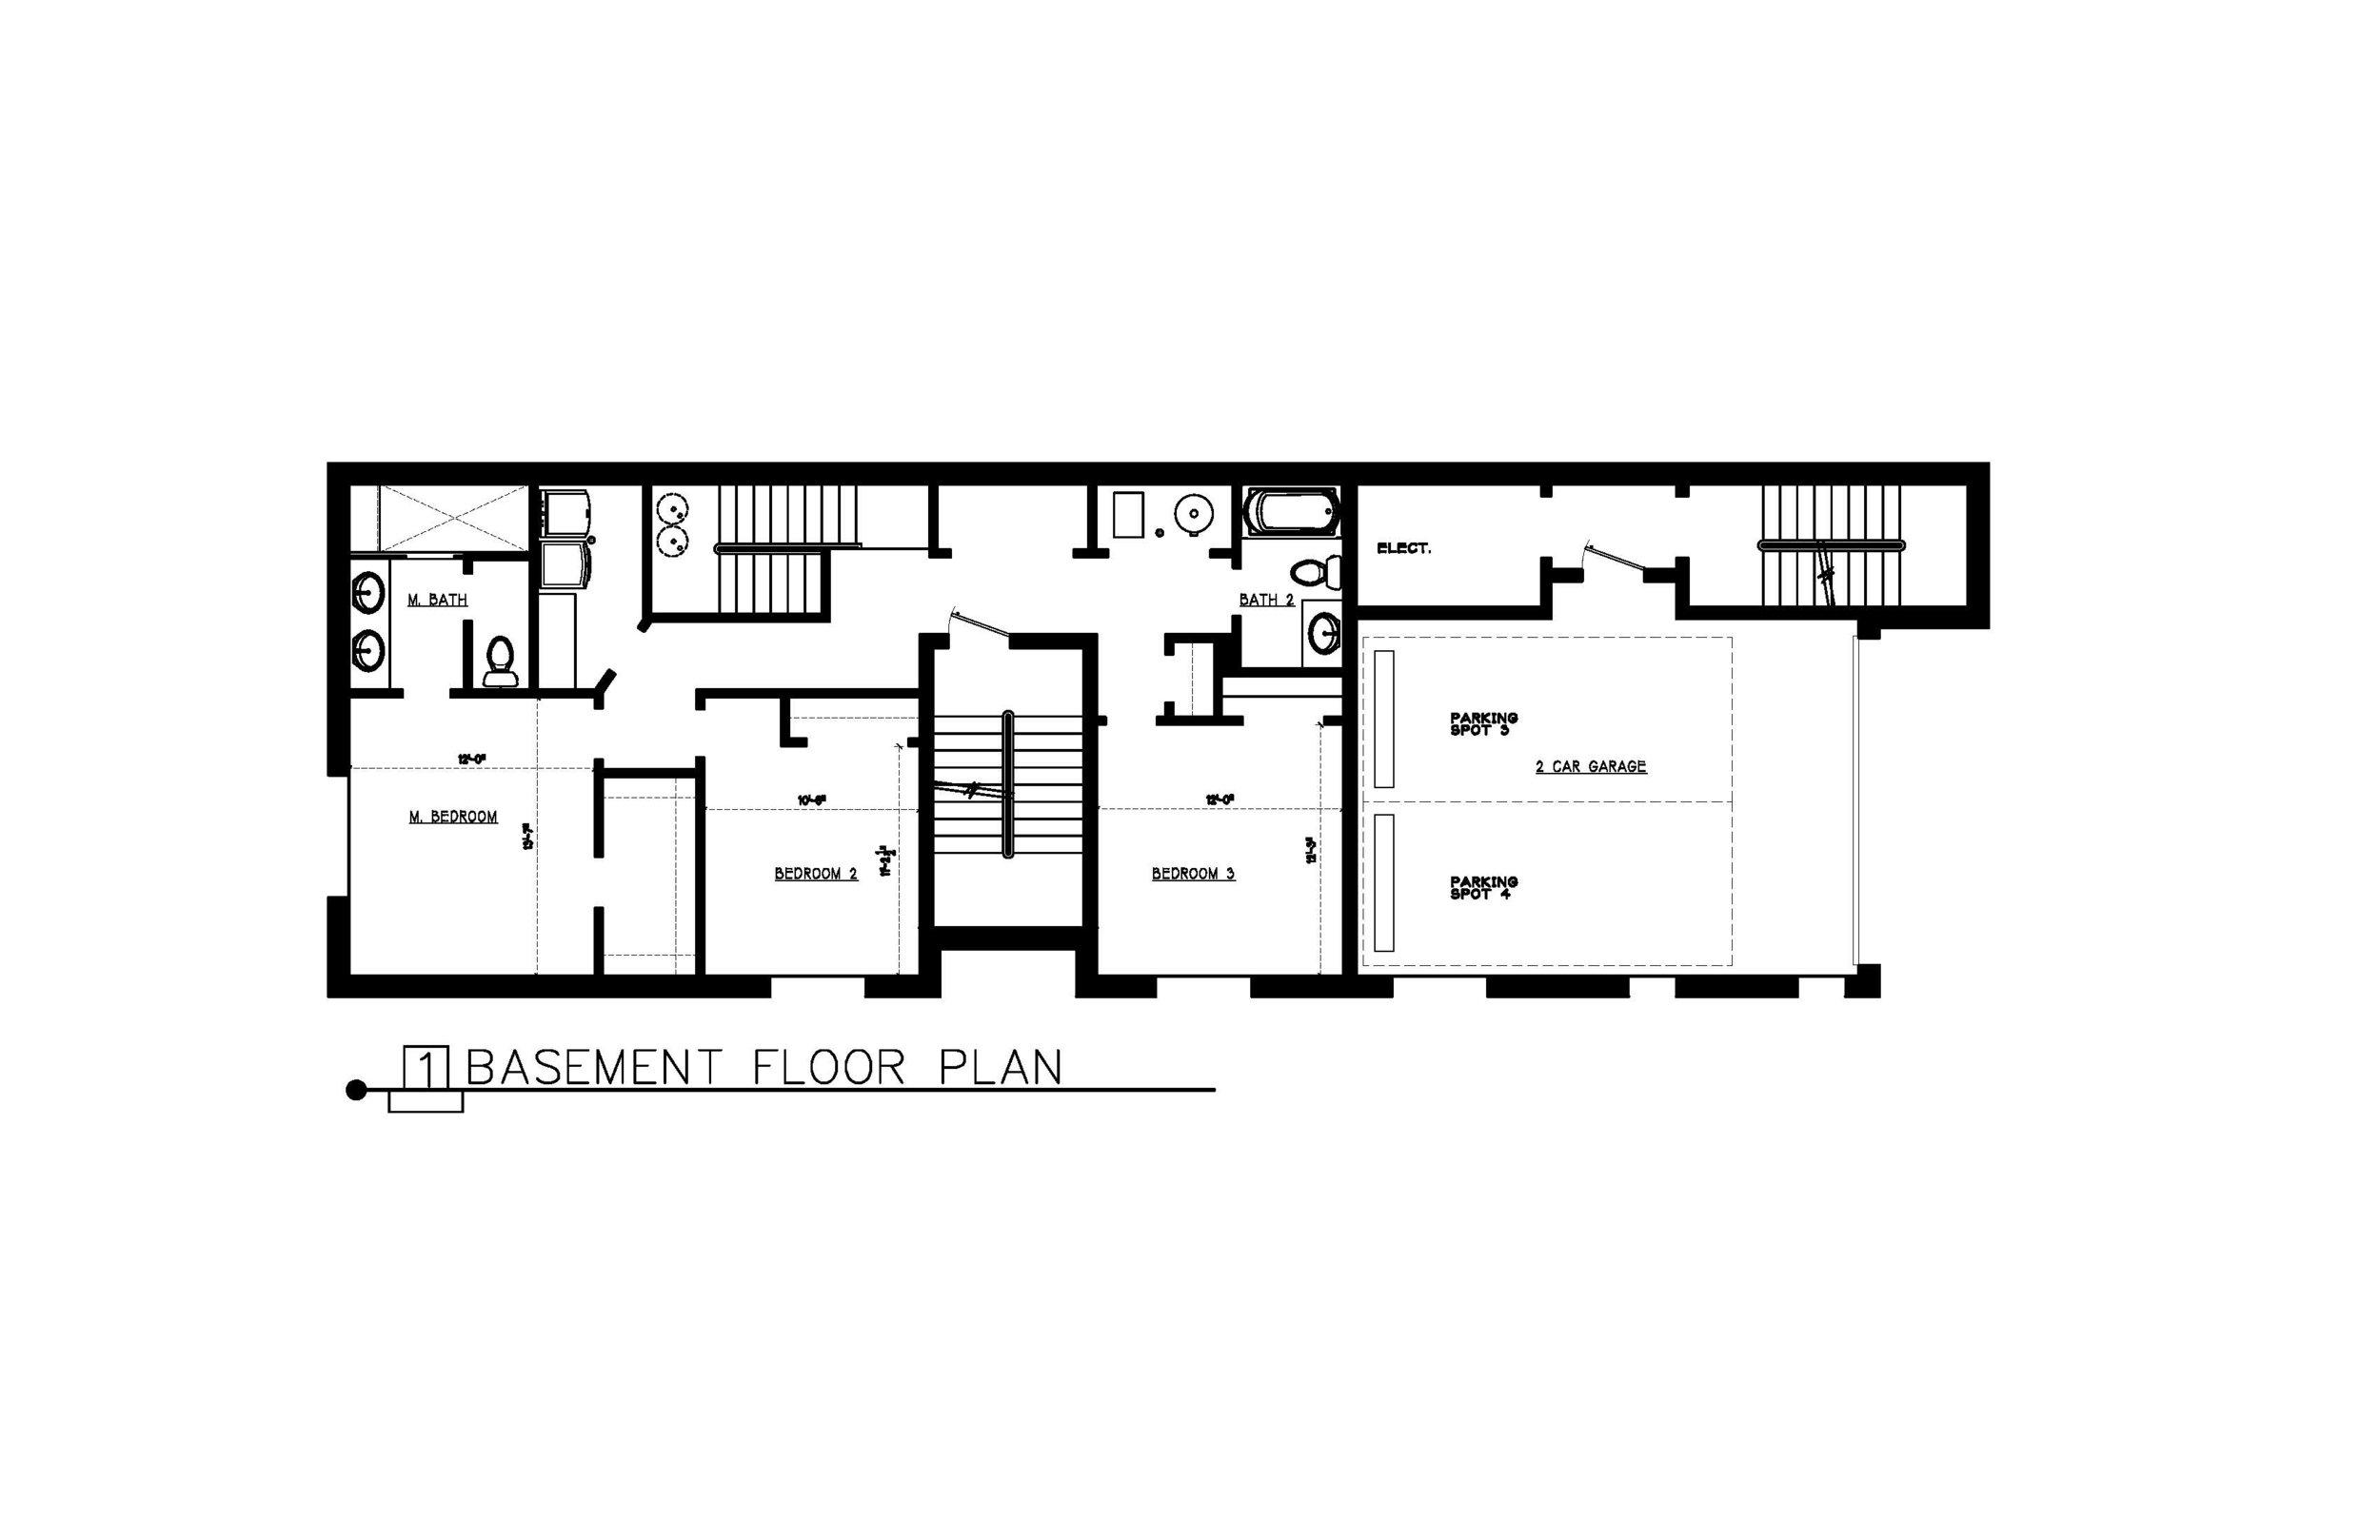 1600 W Hollywood Floor Plan 2.jpg